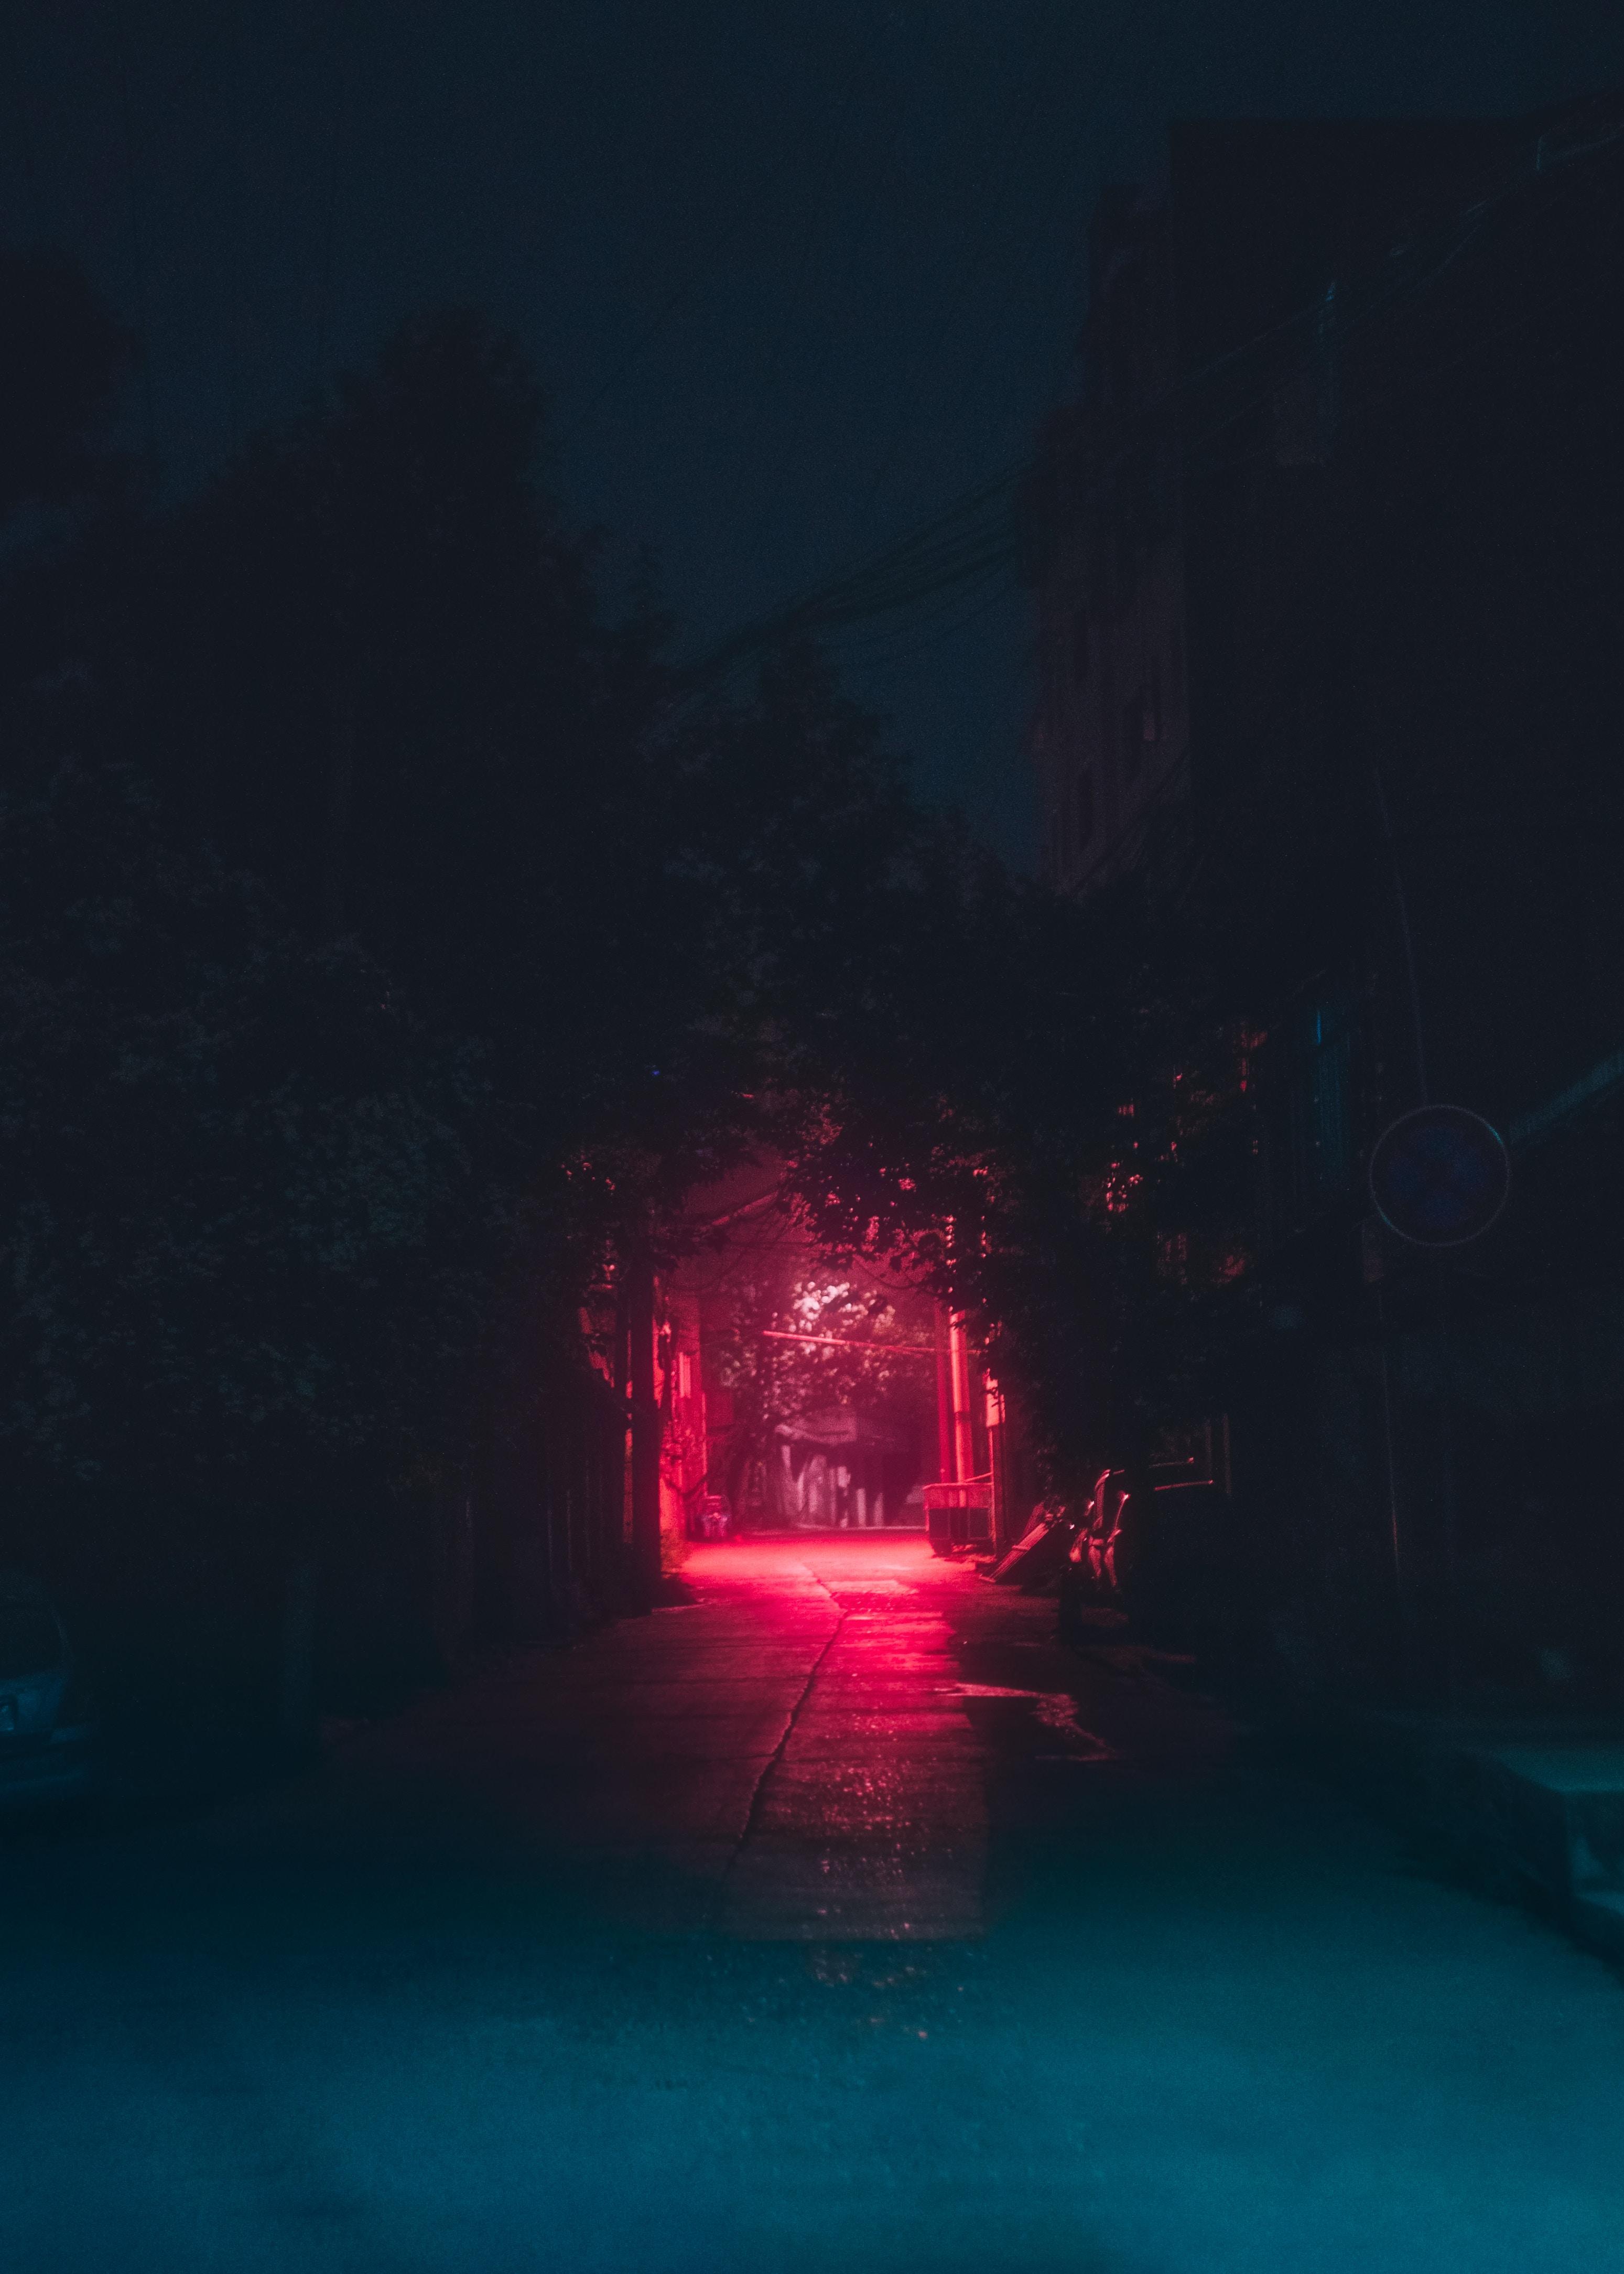 115221 download wallpaper Dark, Night, Illumination, Lighting, Urban, Lane screensavers and pictures for free